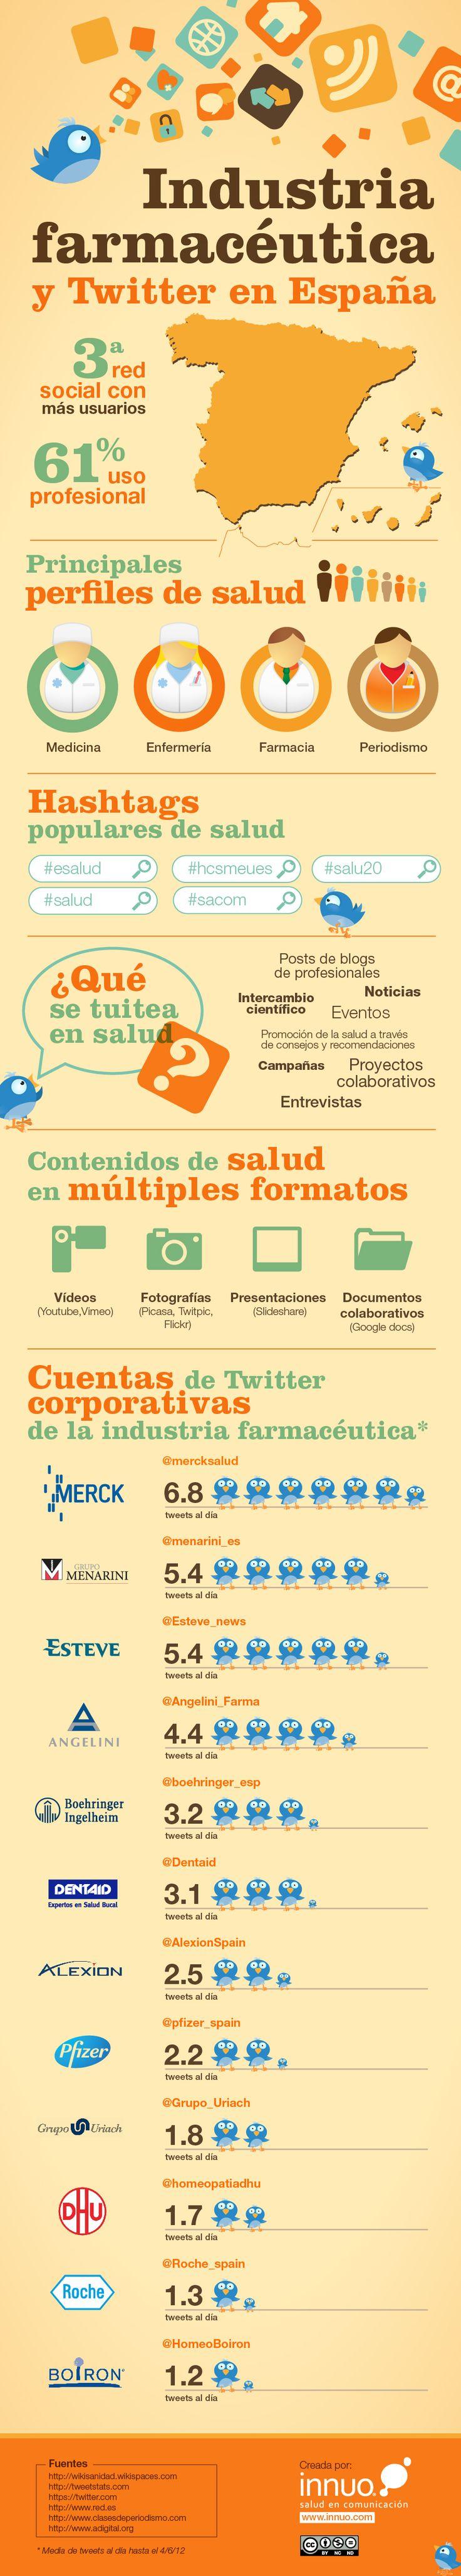 Pharma industry and Twitter in Spain - Industria farmacéutica y Twitter en España by innuo http://www.innuo.com